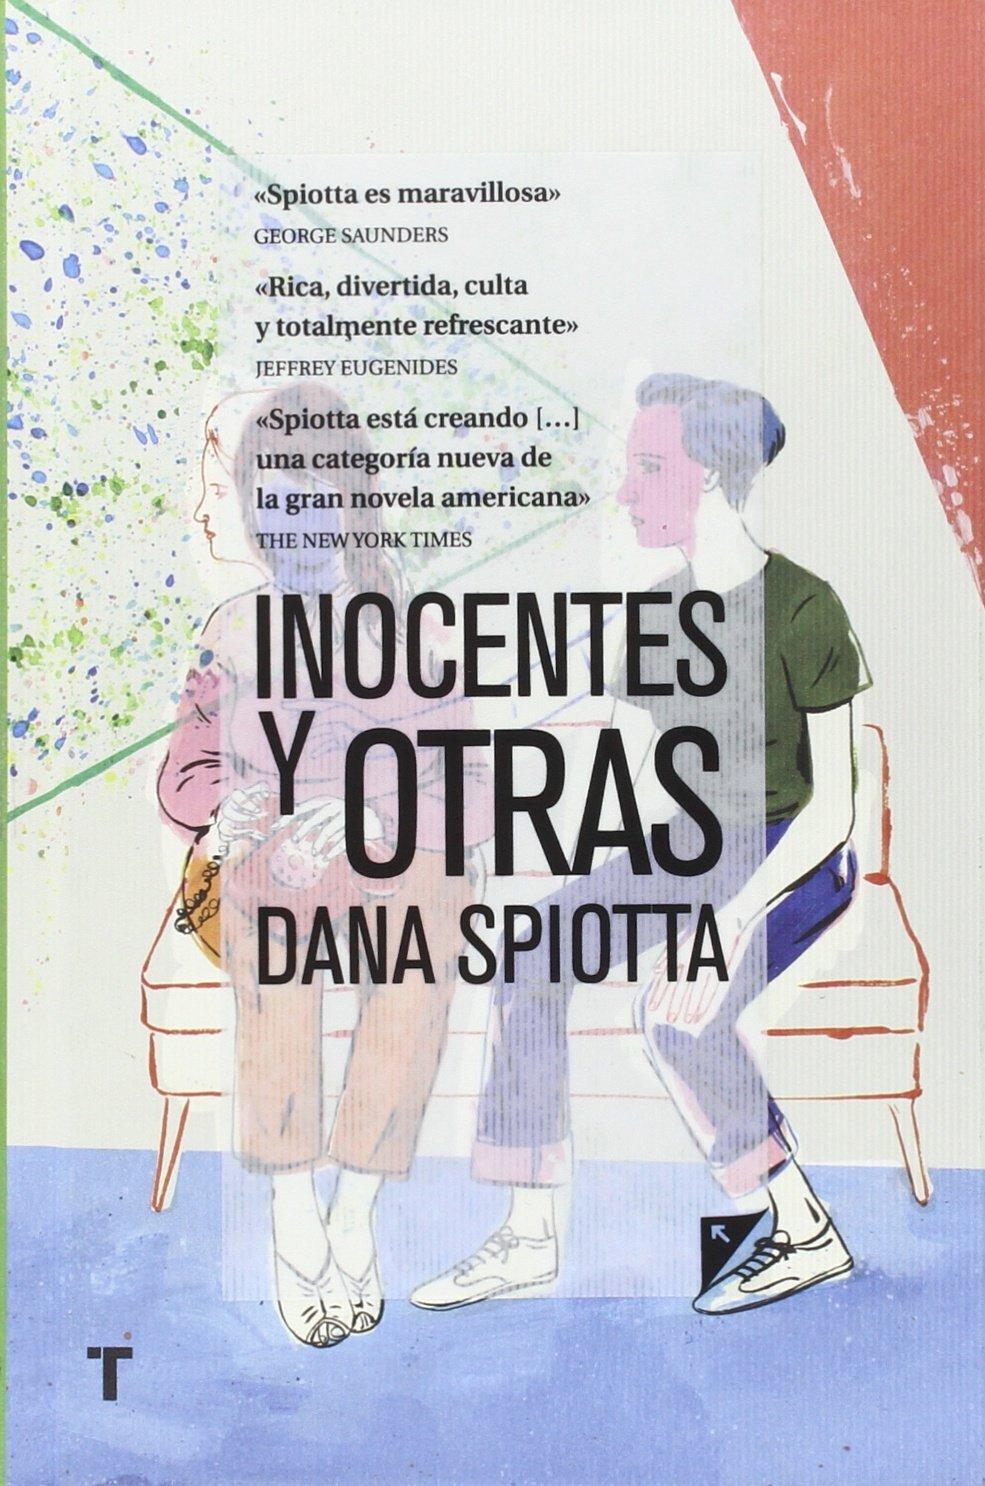 Inocentes y otras (Spanish) Paperback – 2013